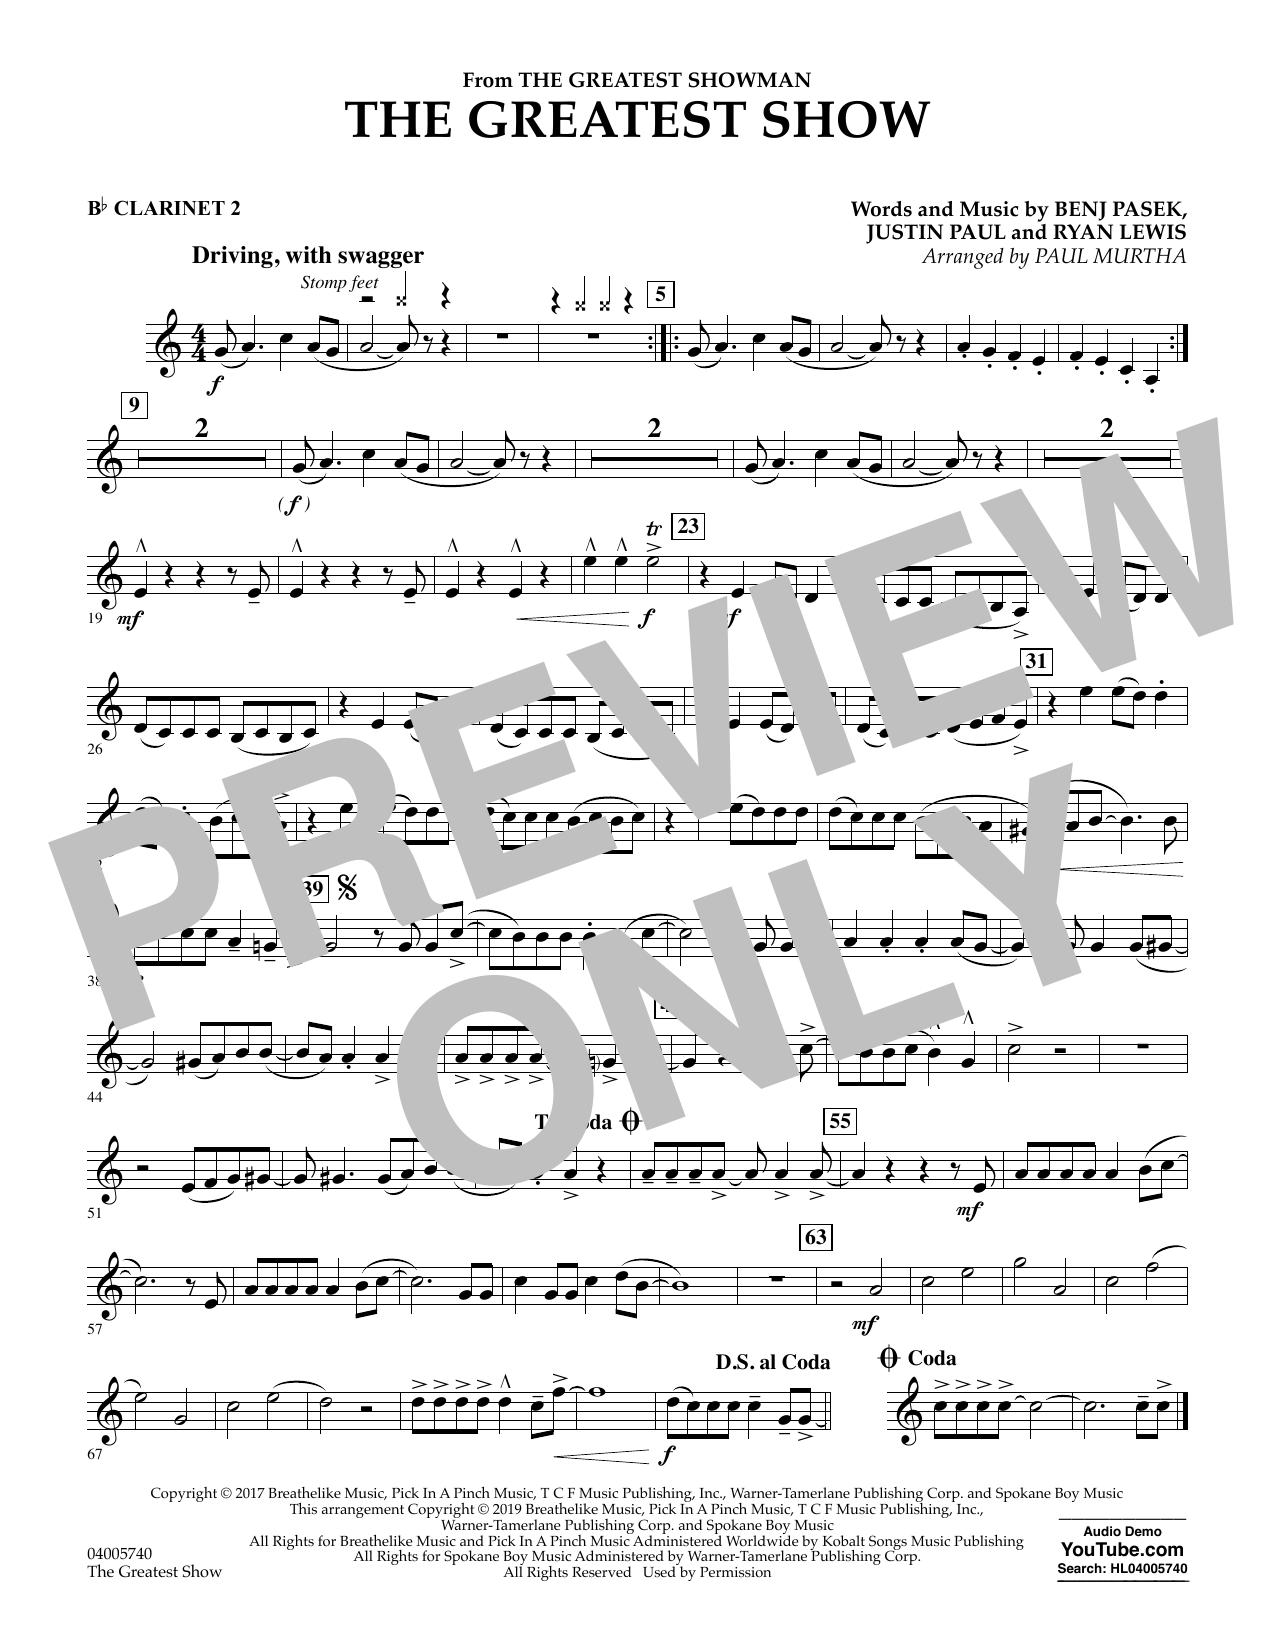 The Greatest Show  (arr. Paul Murtha) - Bb Clarinet 2 (Concert Band)